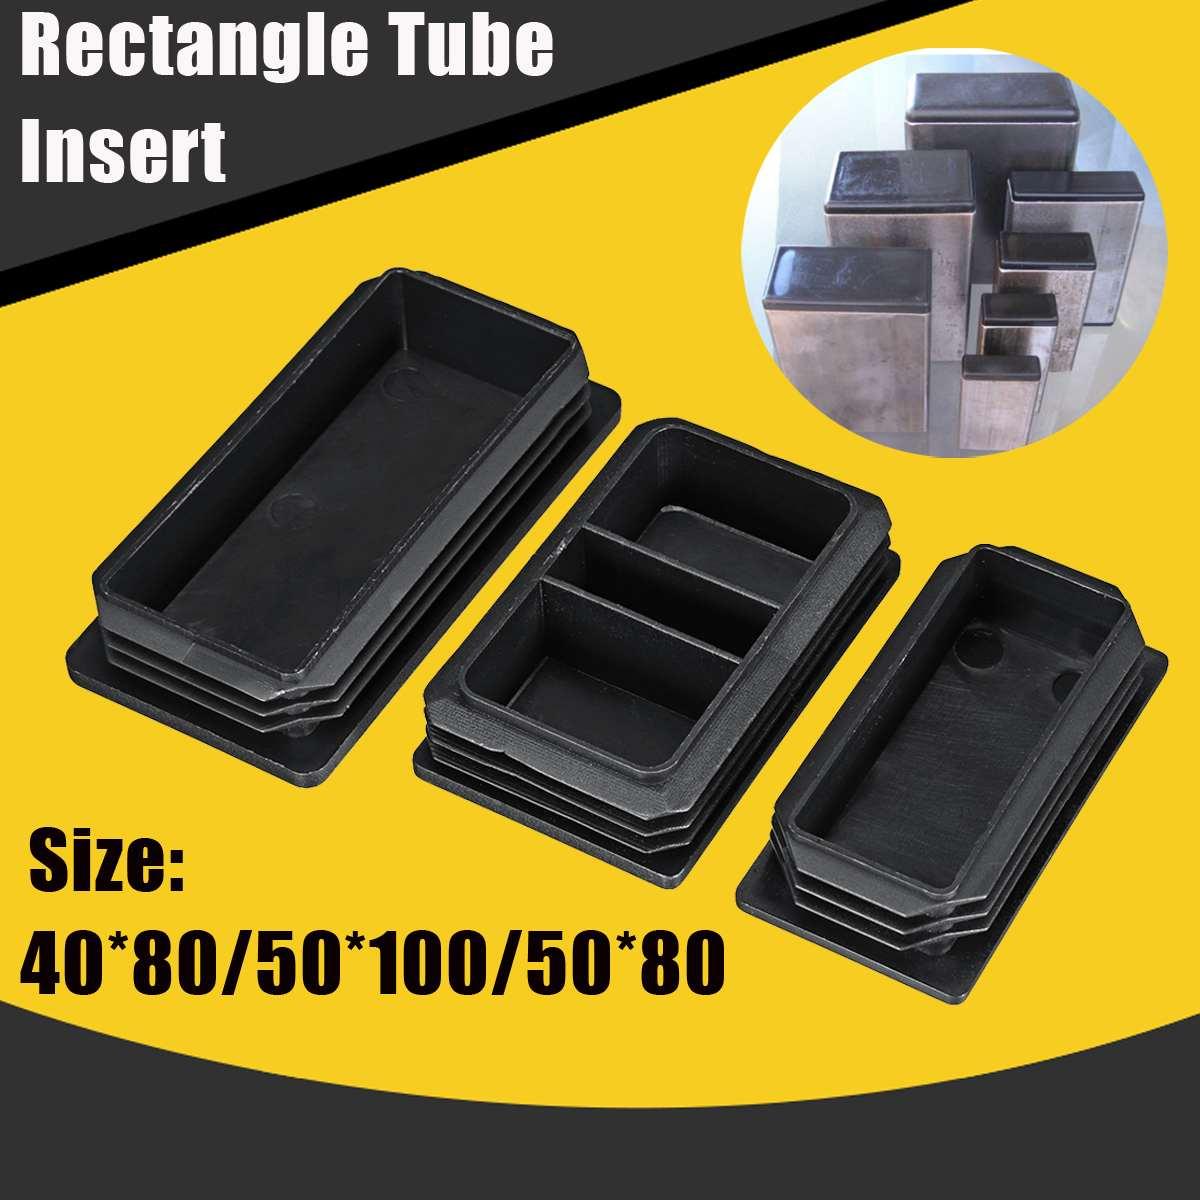 40x80/50x100/50x80 Rectangle Tubing Insert Plastic End Cap Finishing Plug Oblong Hole Insert